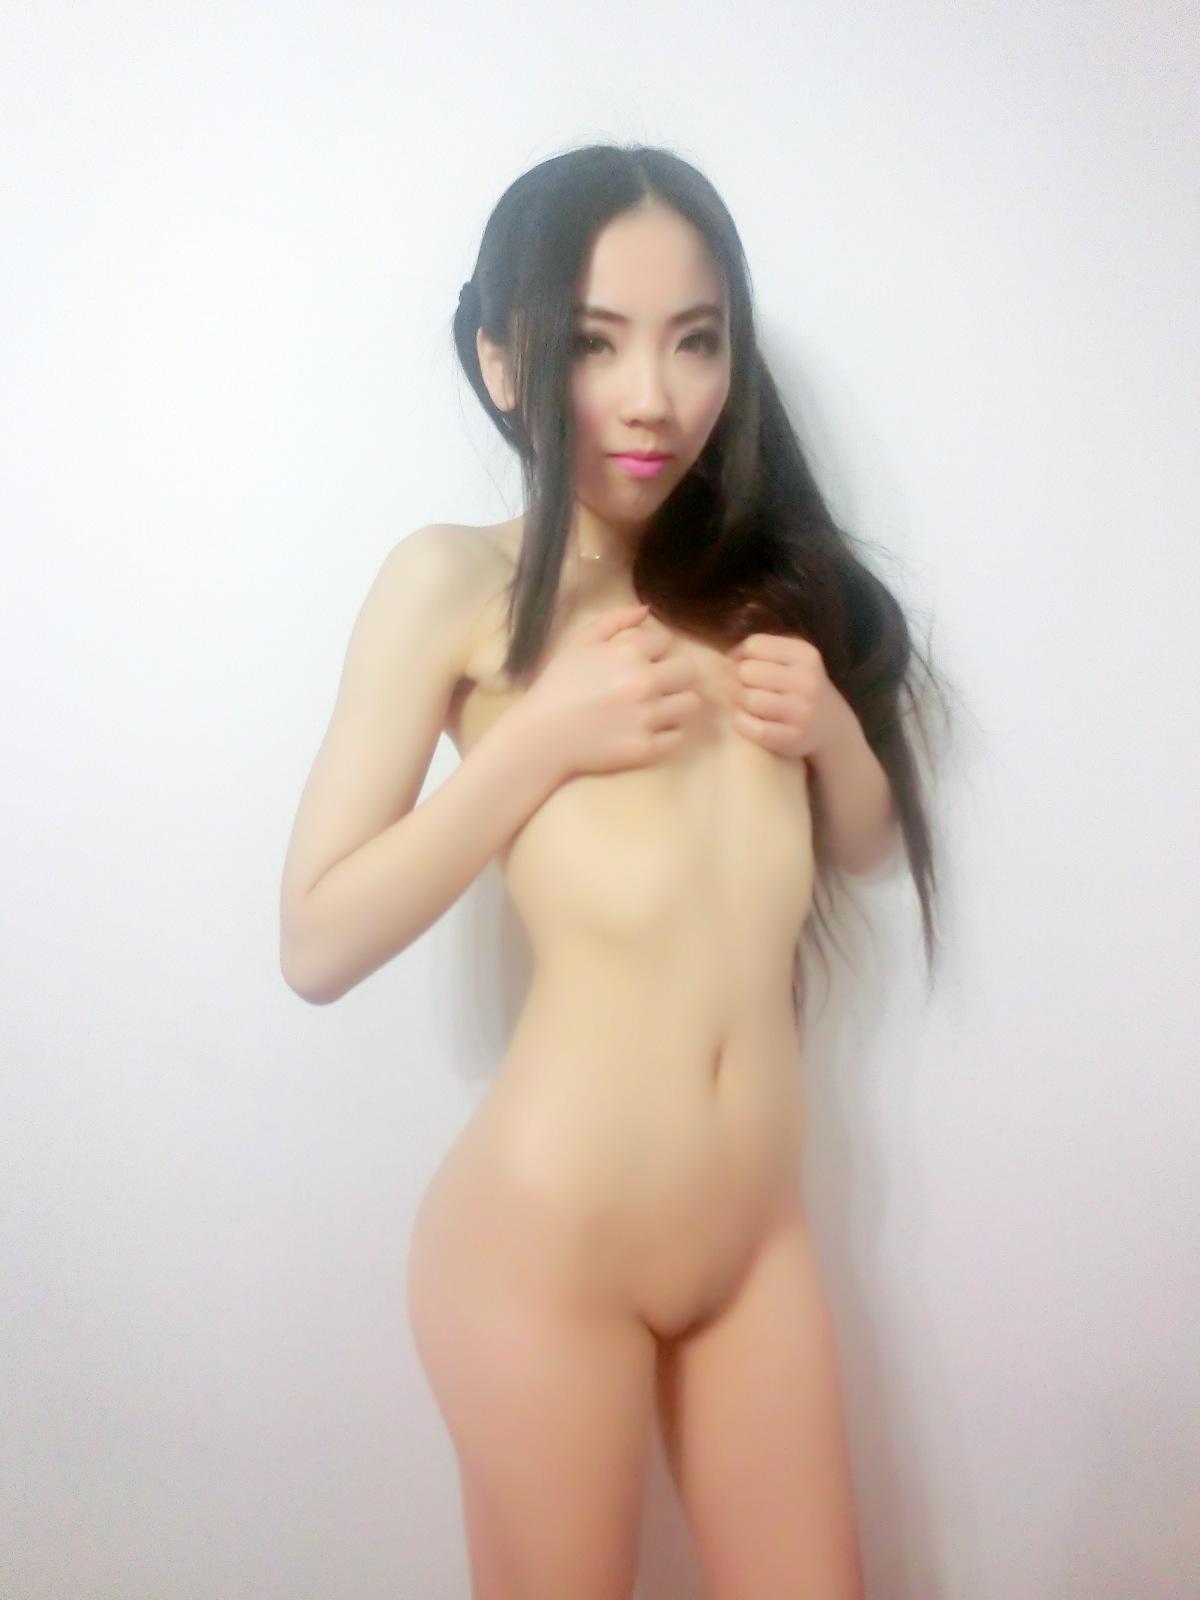 Girl eating pussy public